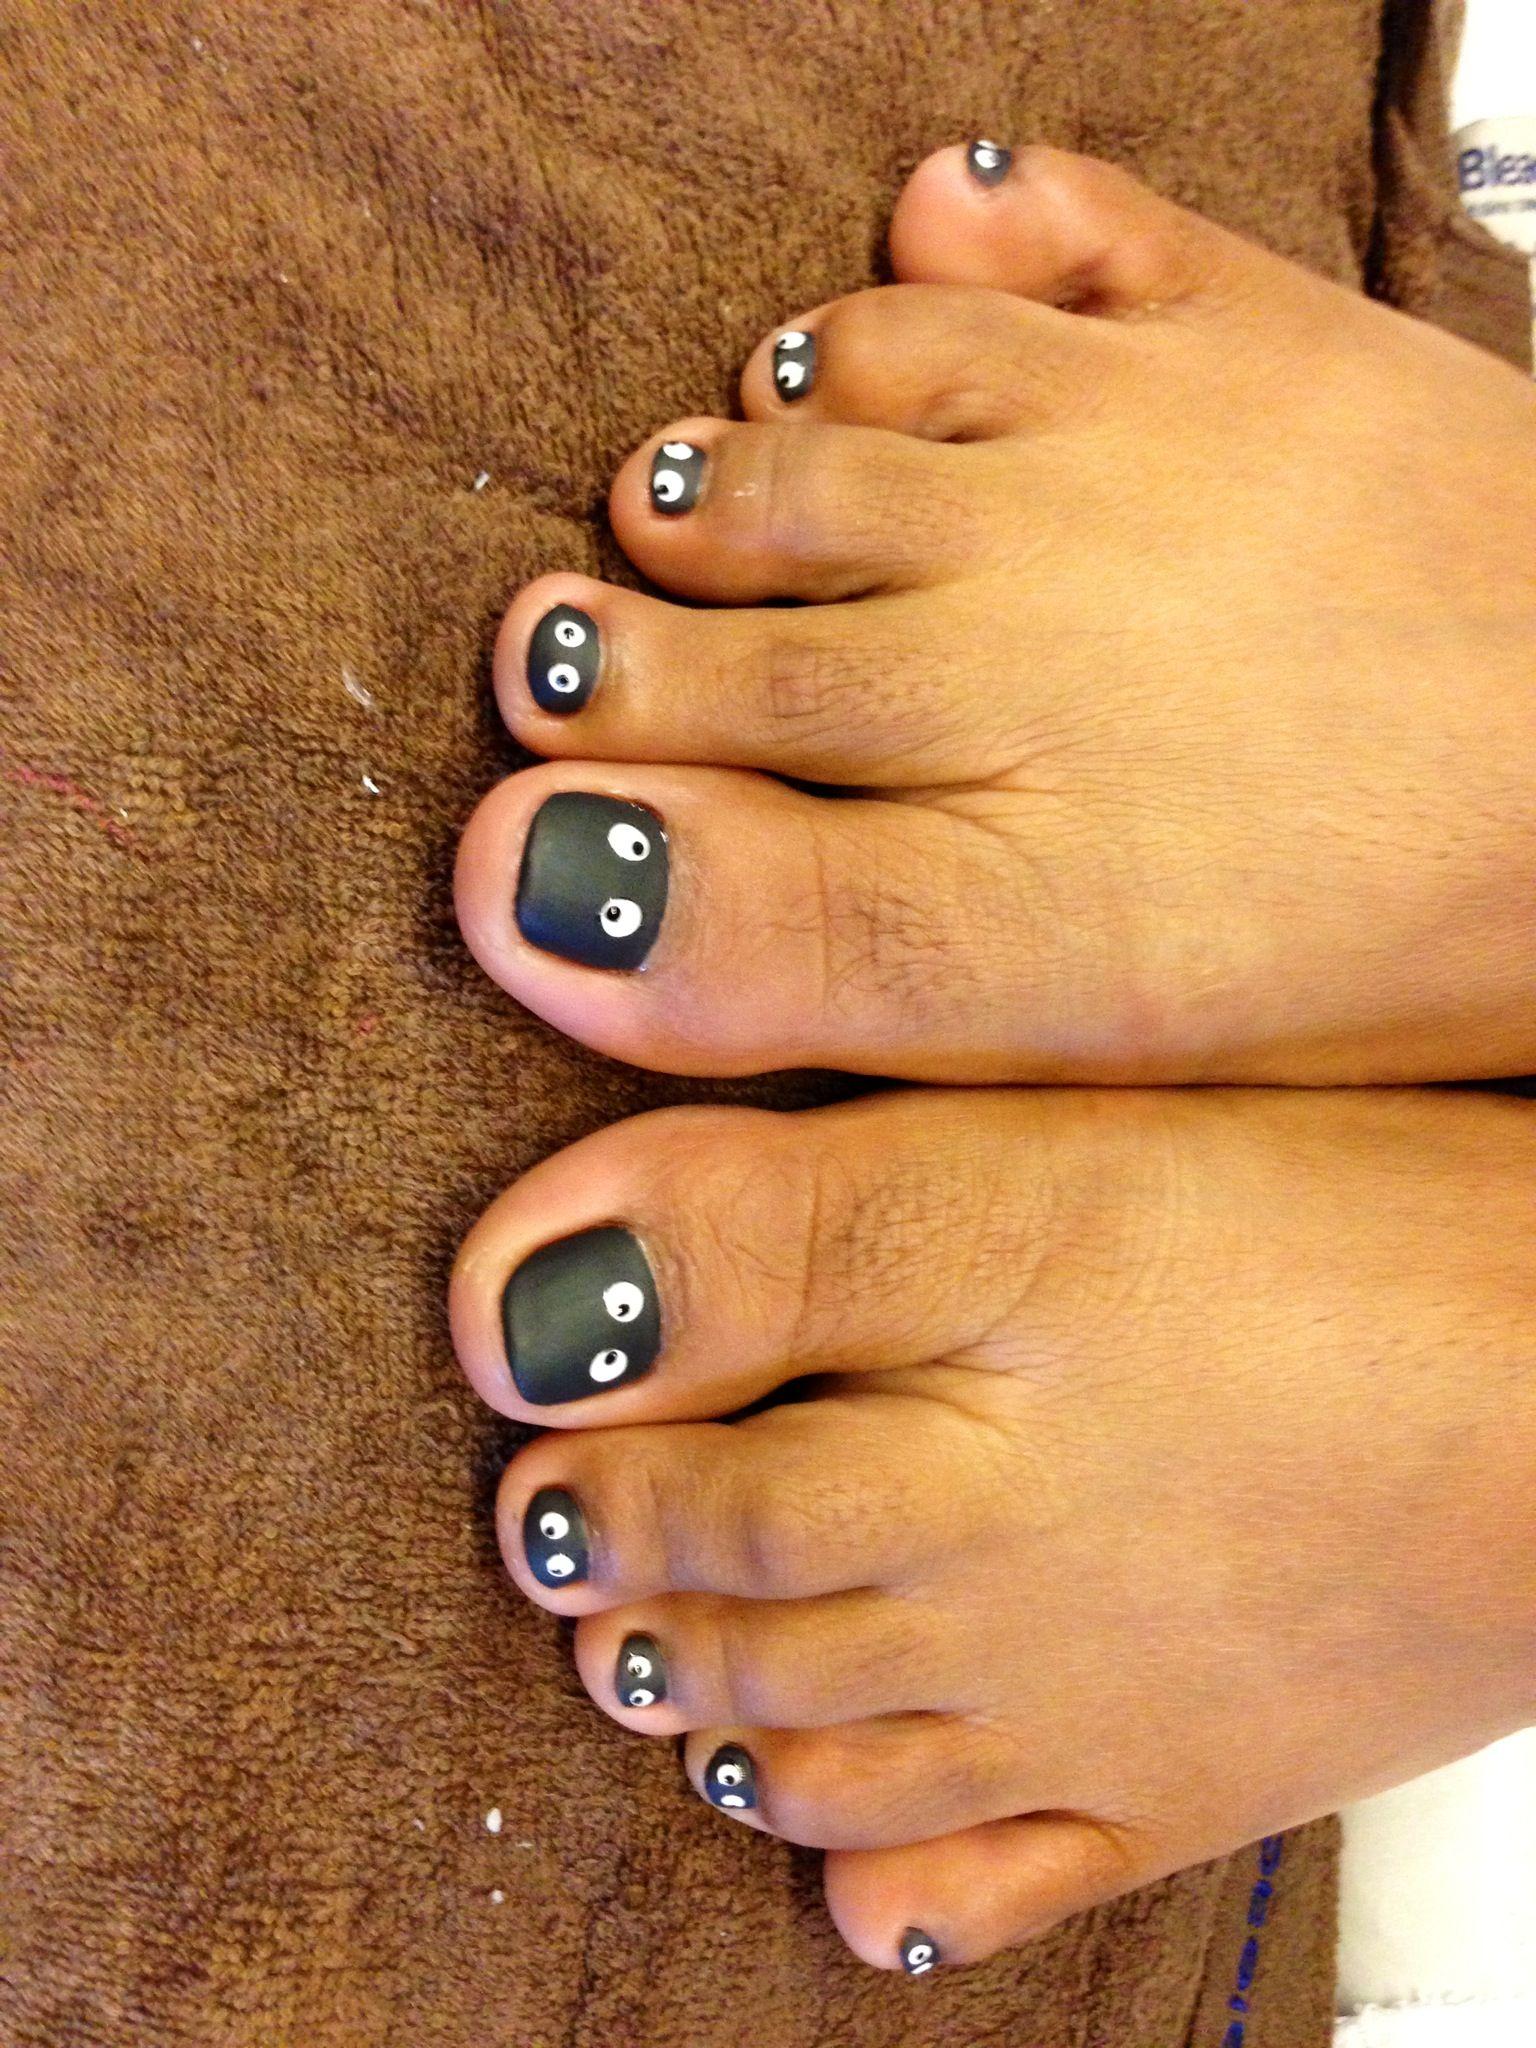 Ghost nails | Cute toe nails, Pedicure designs toenails ...